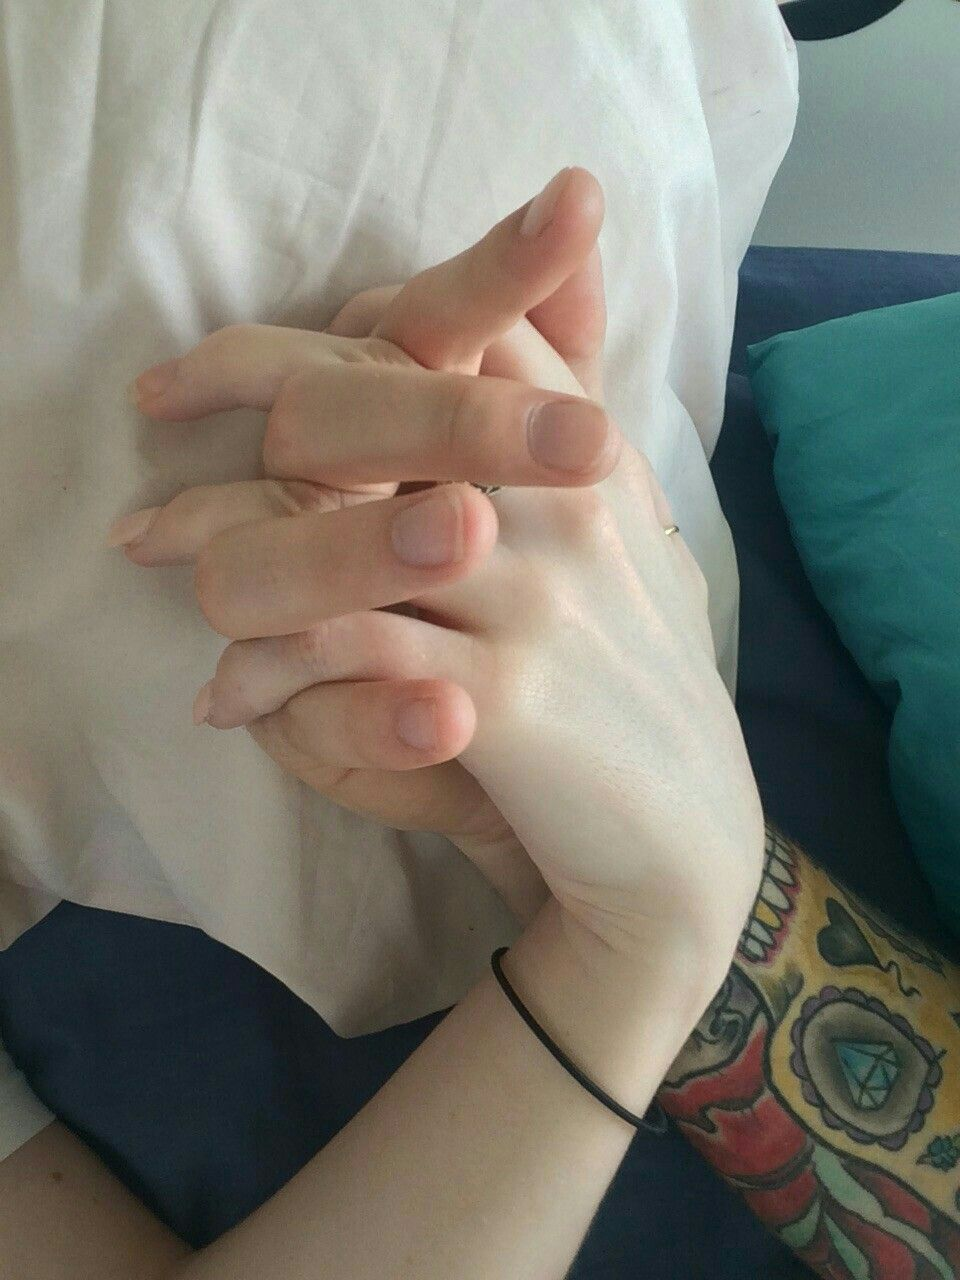 рукка в руке фото она